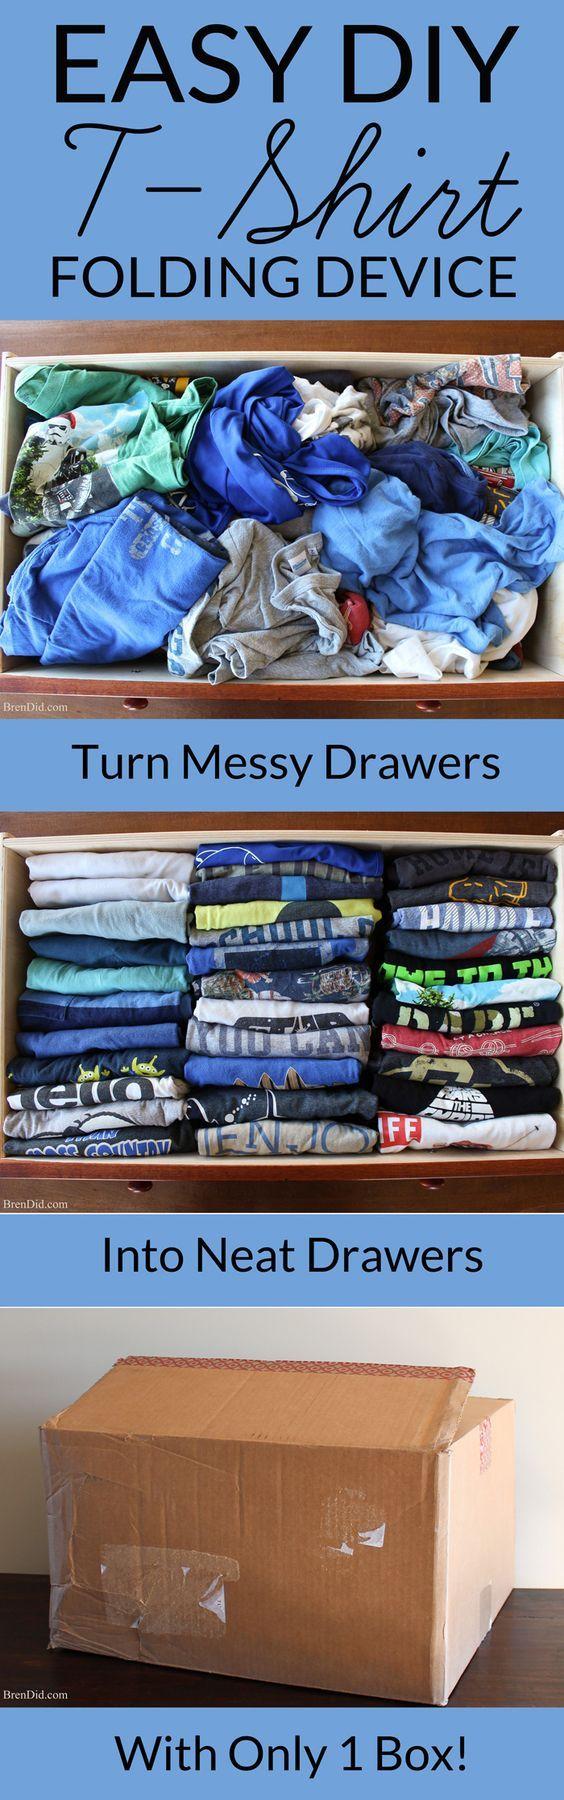 25+ unique Cardboard wardrobe ideas on Pinterest | Wardrobe boxes ...